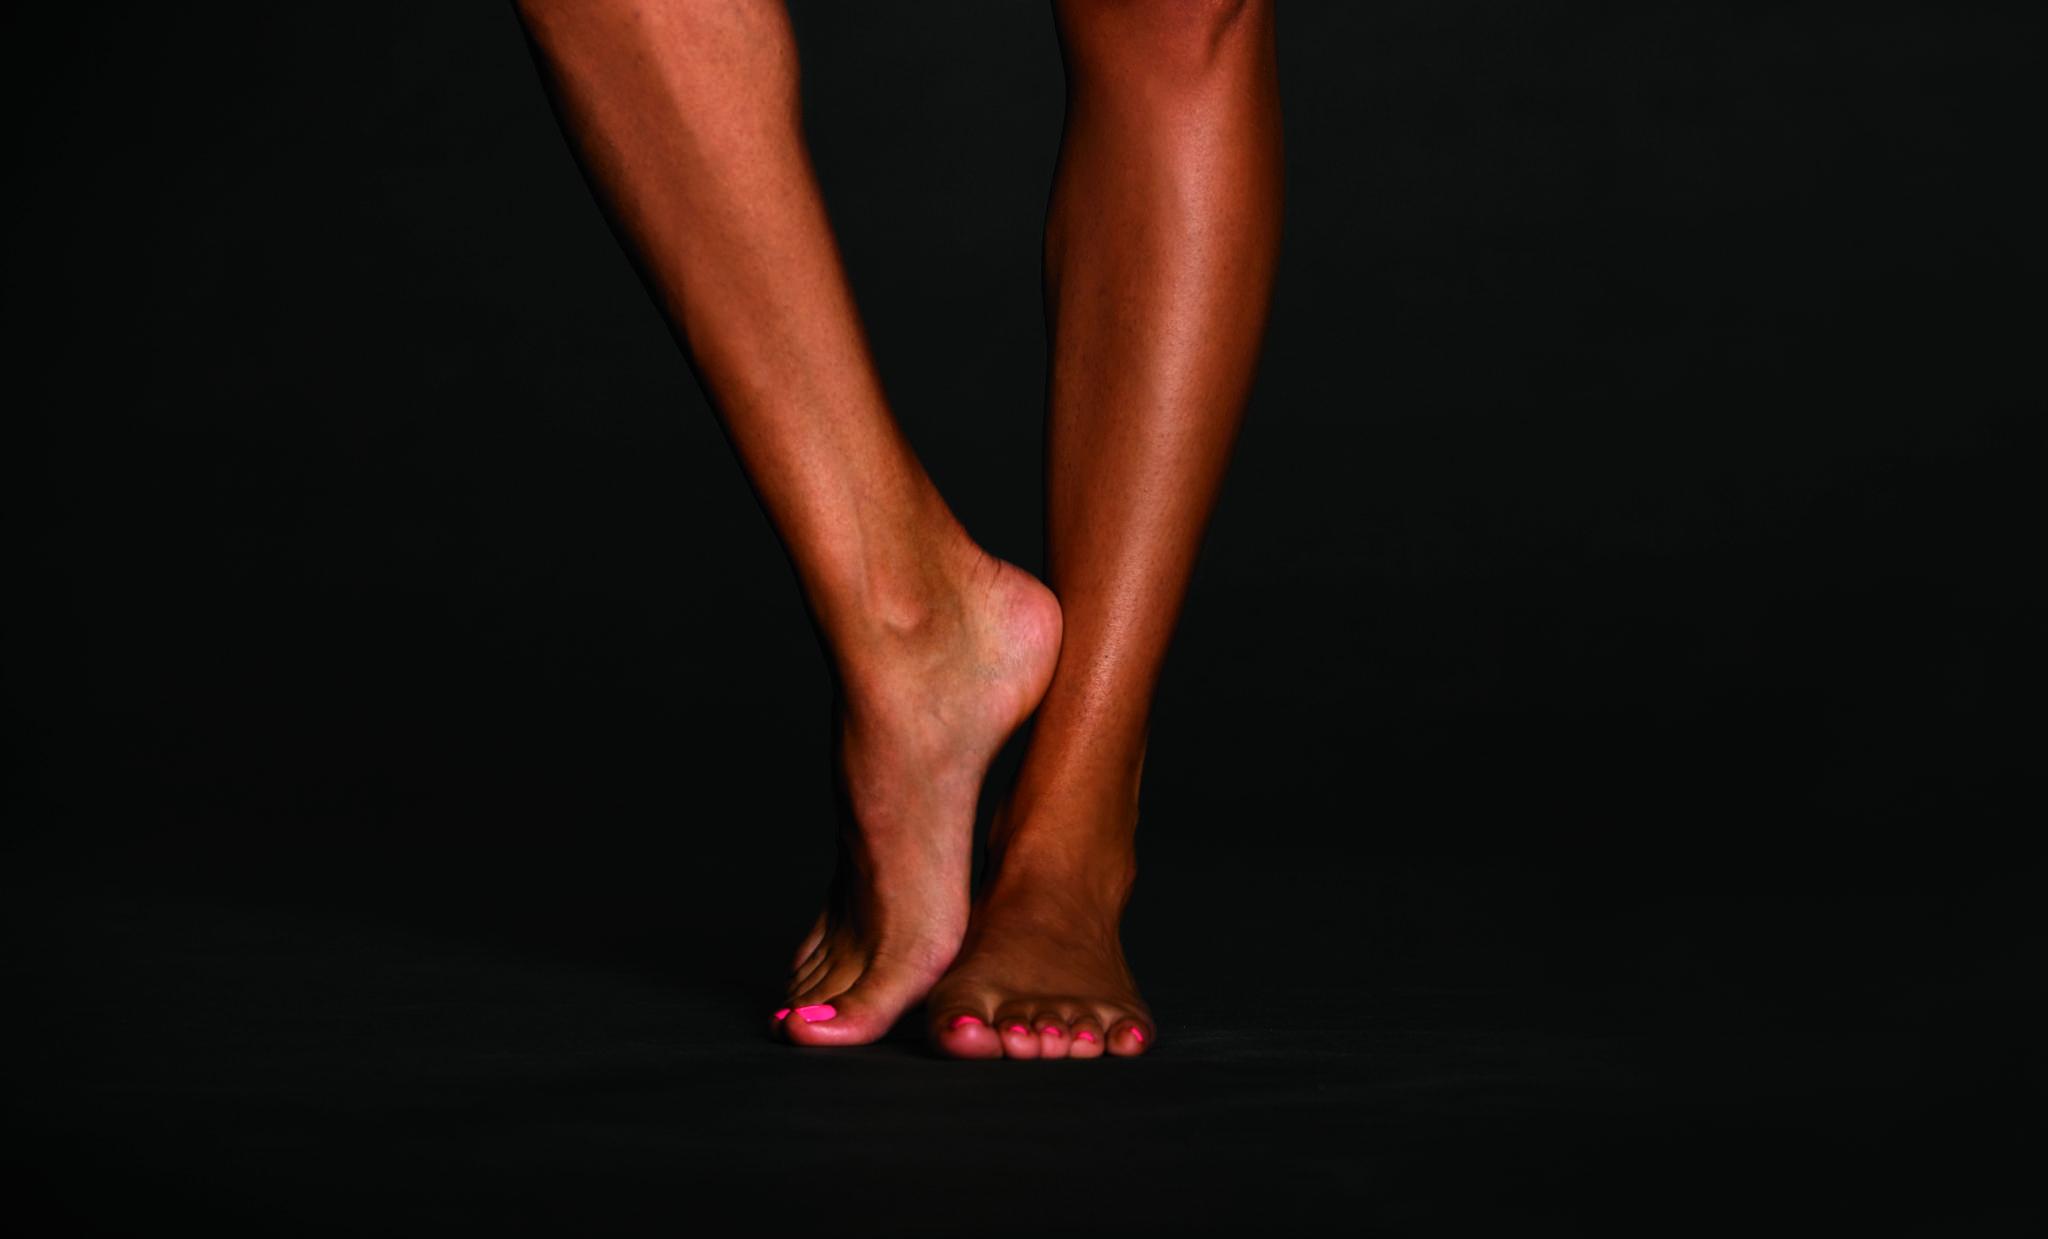 Comment soigner vos blessures aux pieds ?